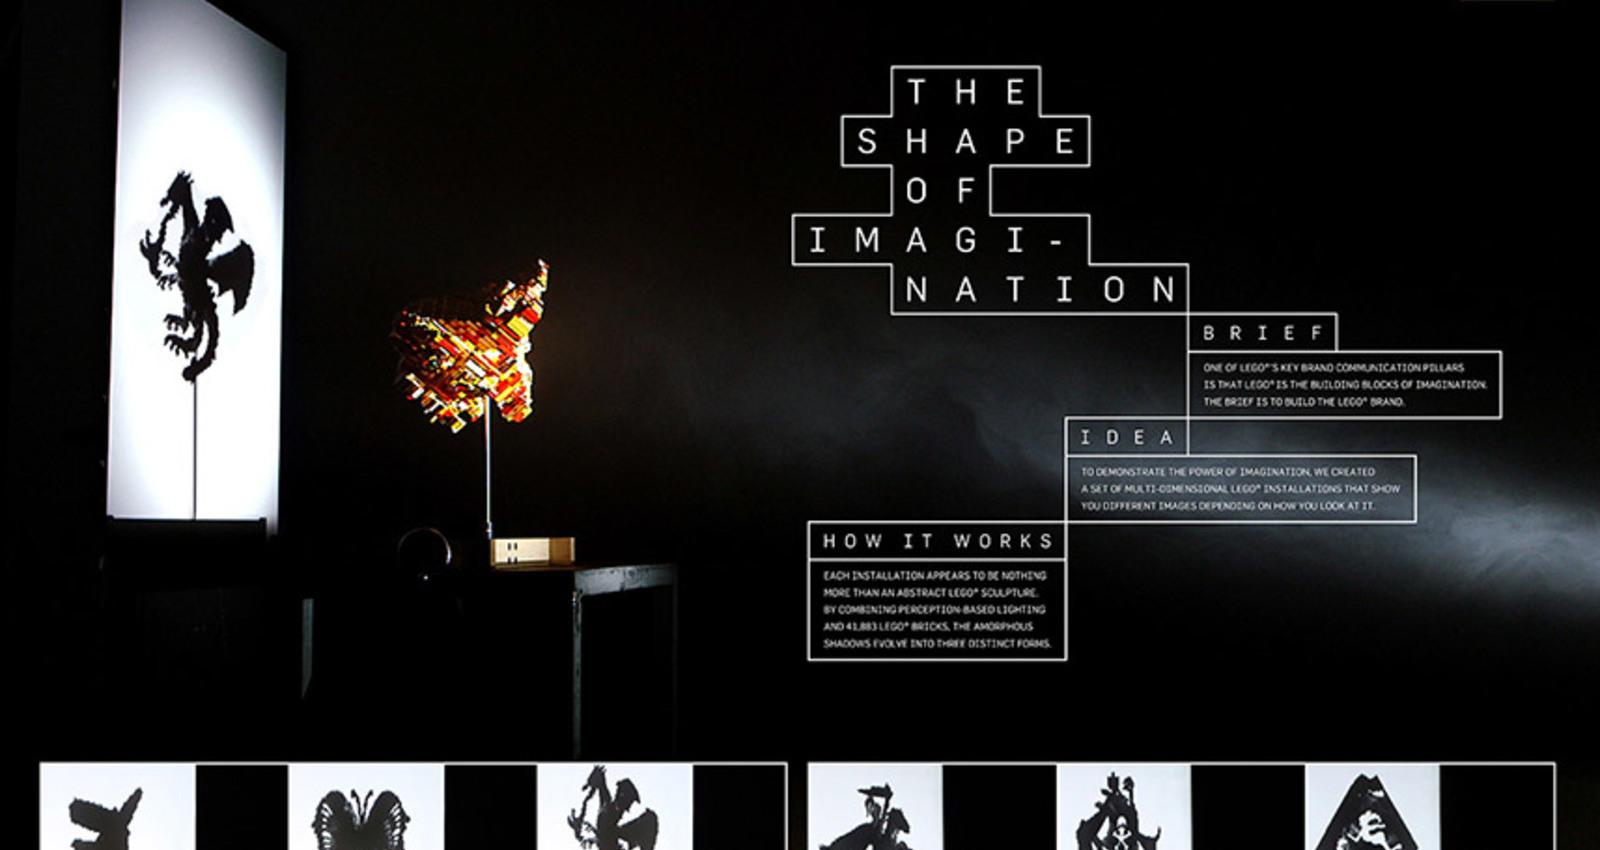 The Shape of Imagination